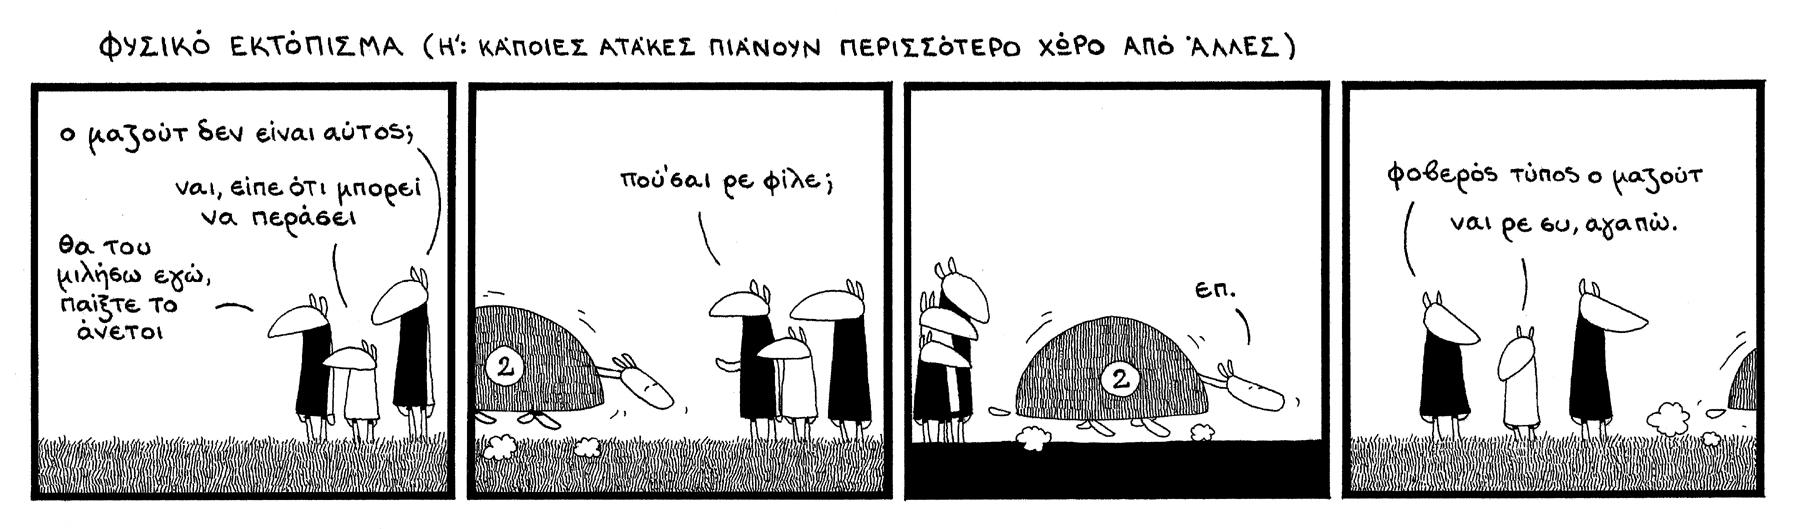 mazutt_